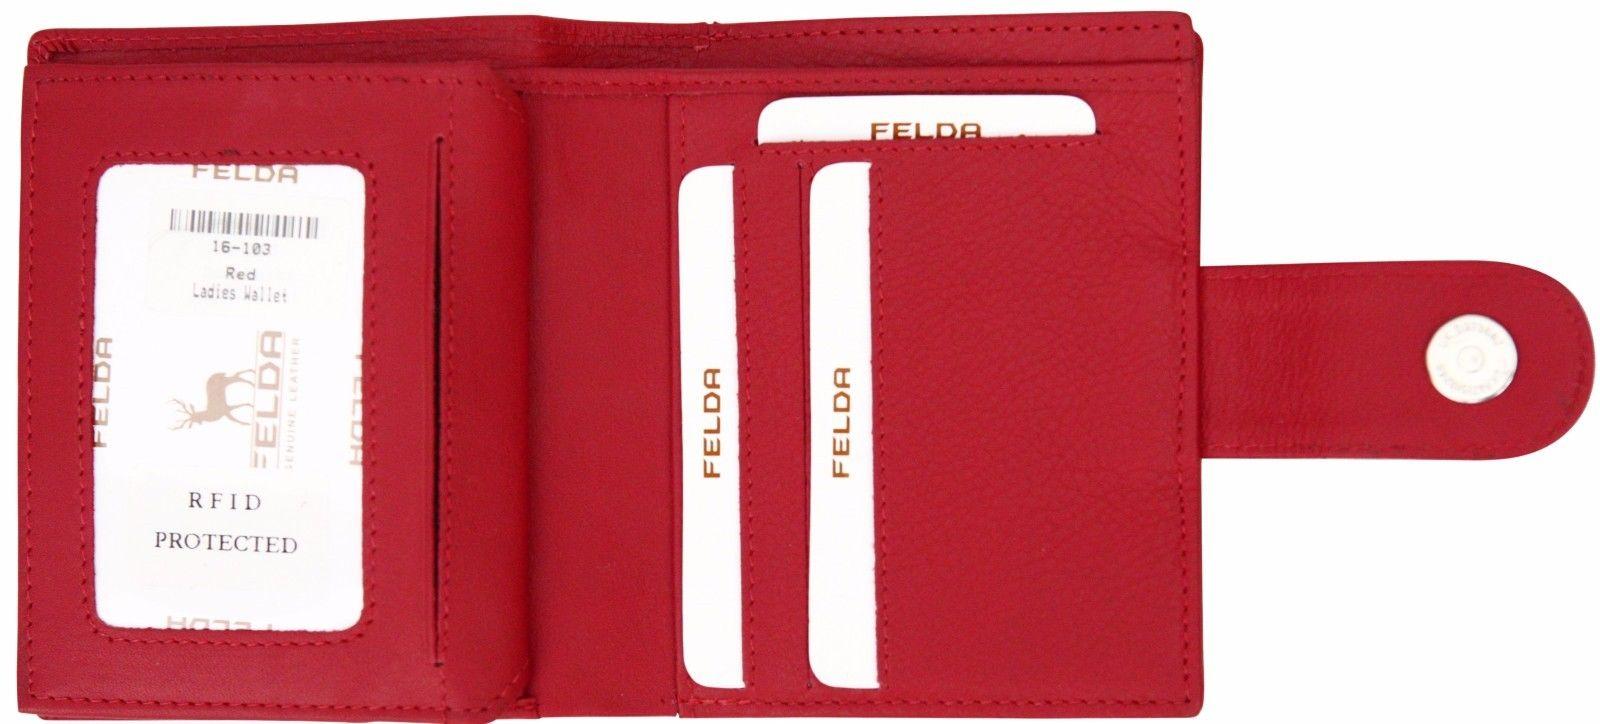 Felda-RFID-onorevoli-MEDAGLIA-amp-Card-Purse-Wallet-Genuine-Leather-Multi-SOFT-BOX-REGALO miniatura 102